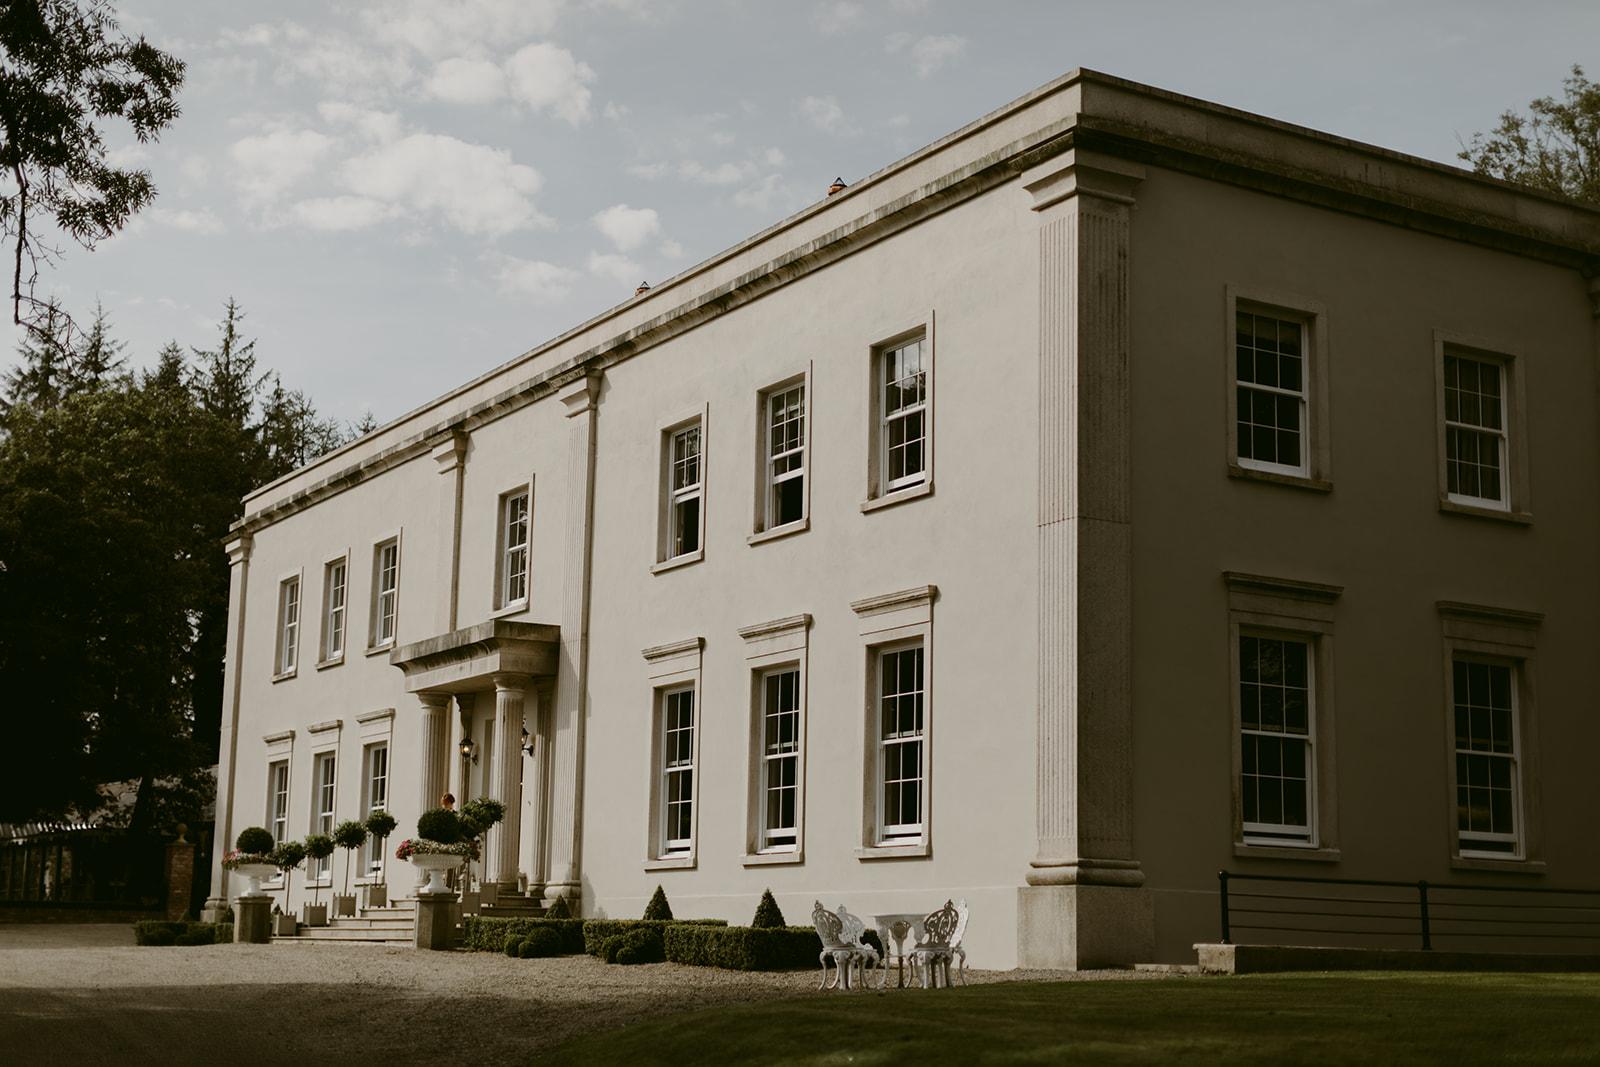 Clonwilliam House